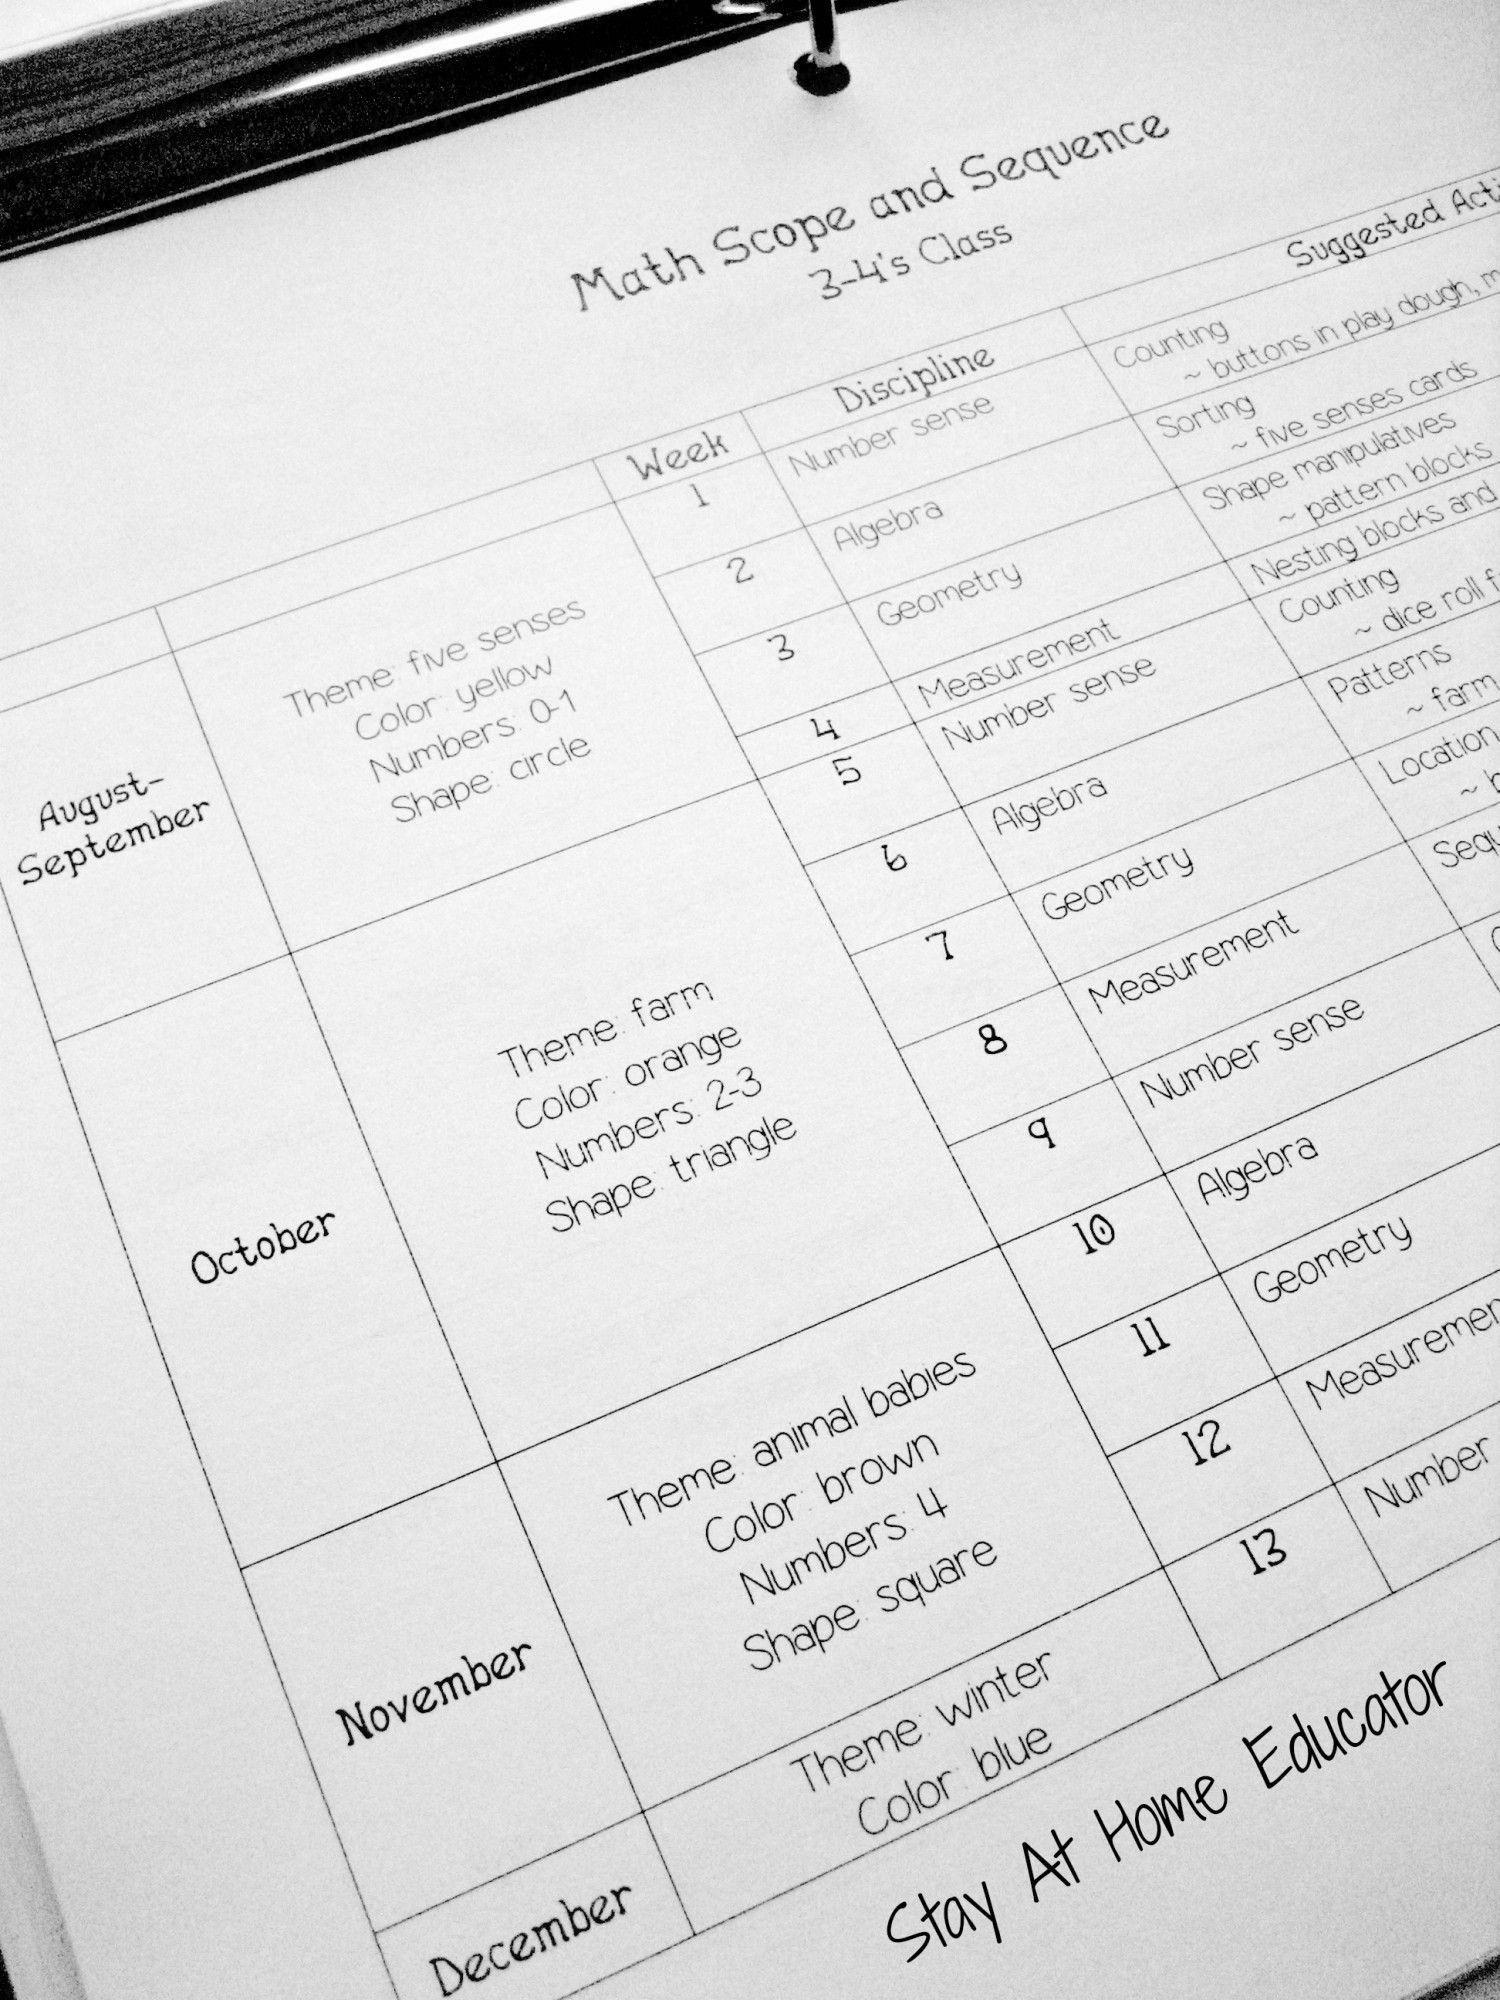 Preschool Lesson planning A Year In Advance | Pinterest | Kind